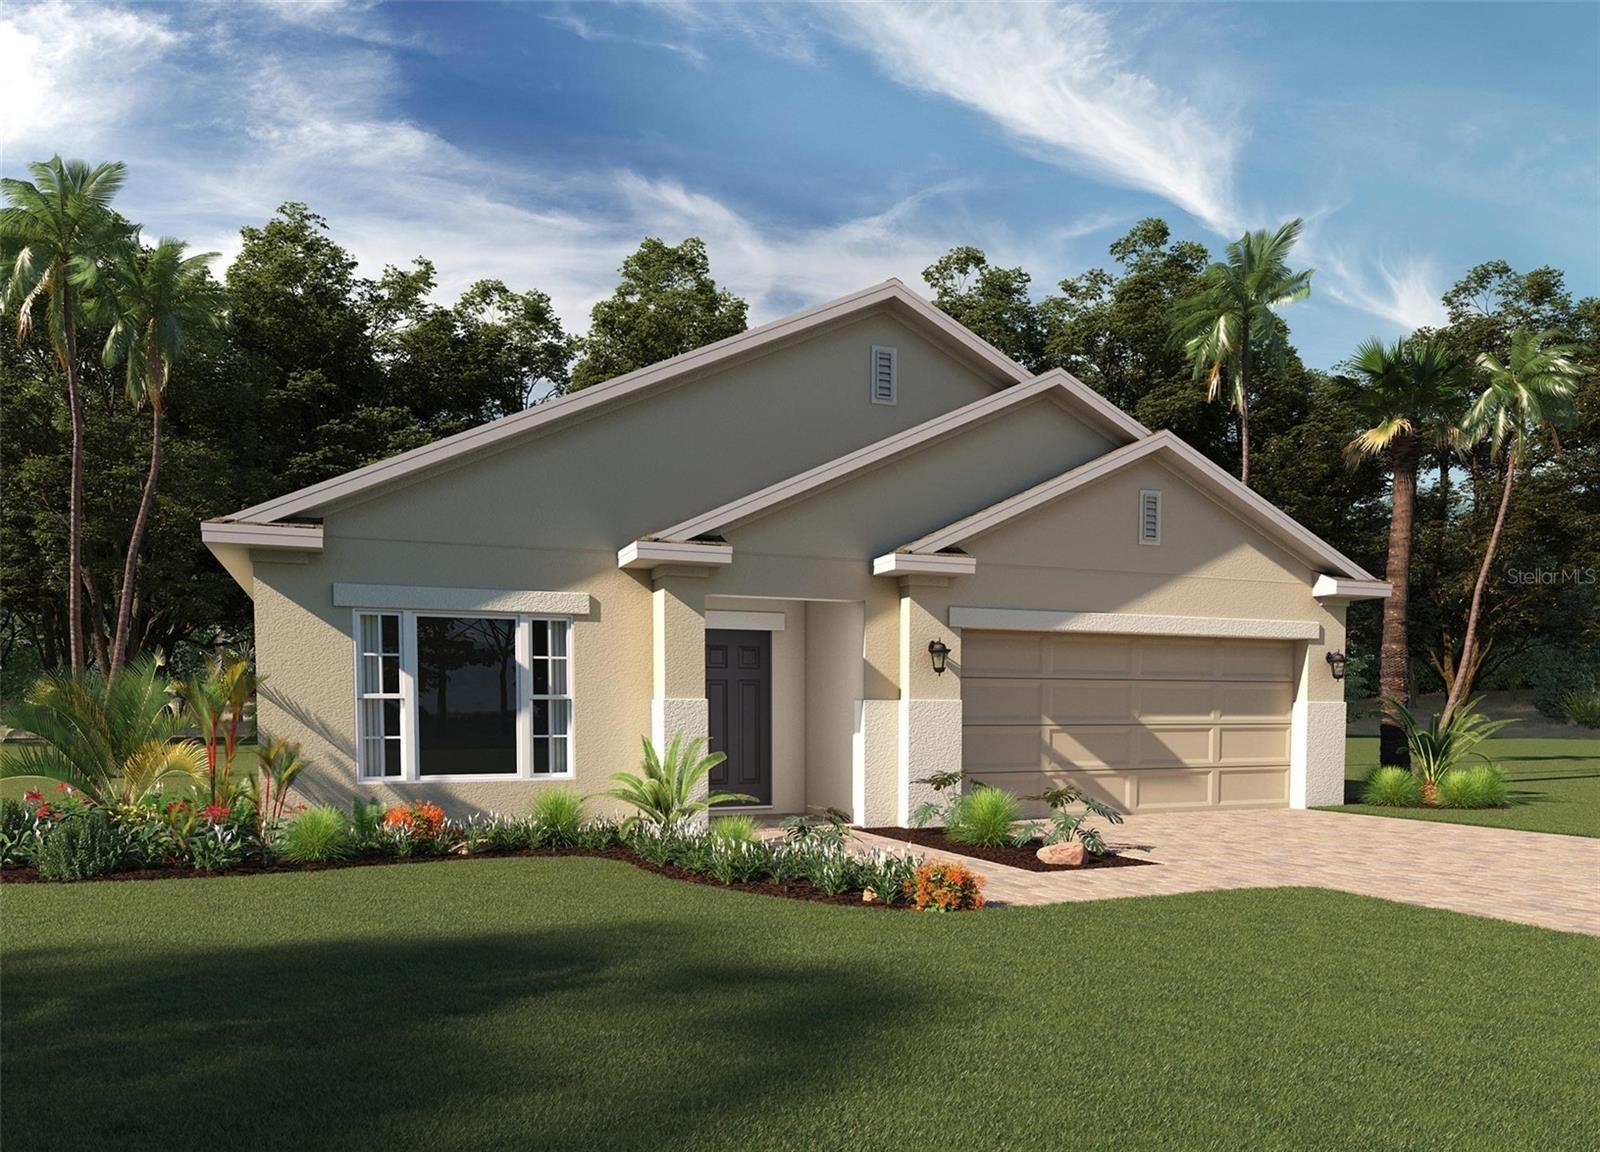 1082 CHASE AUSTIN WAY, Sanford, FL 32771 - #: O5973371